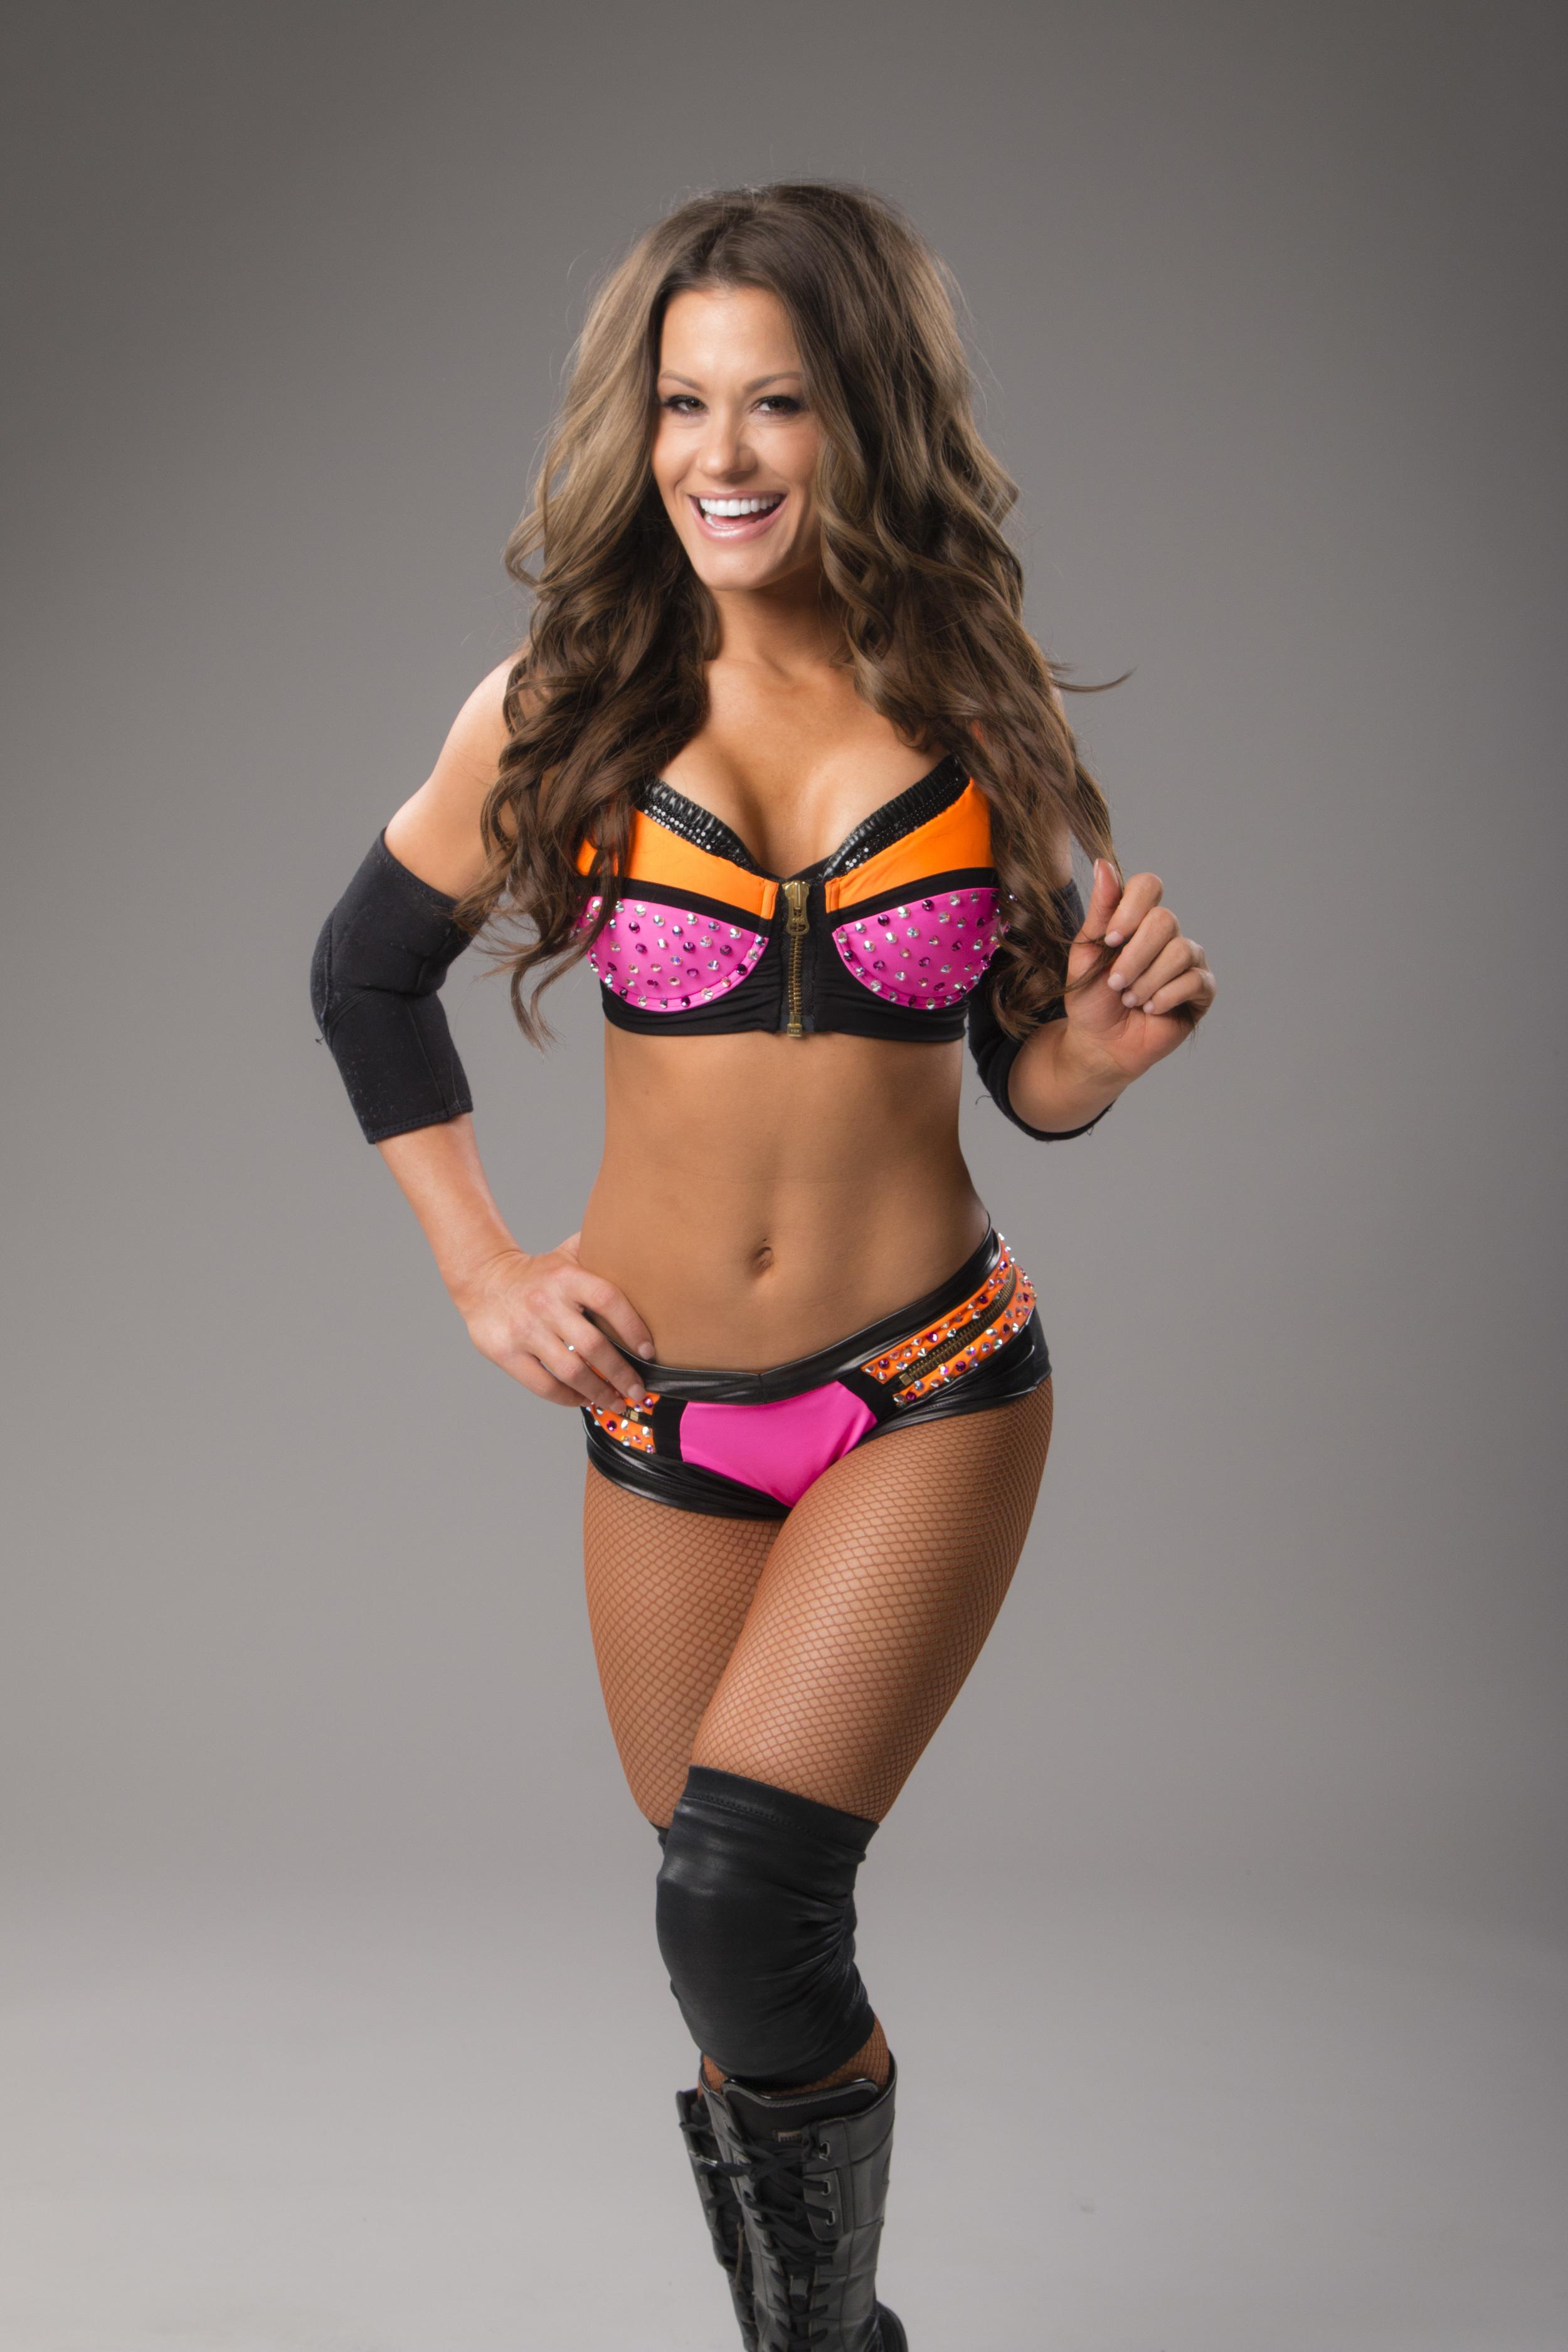 Brooke Adams - Photo courtesy of Lee South and TNA Entertainment LLC.jpg